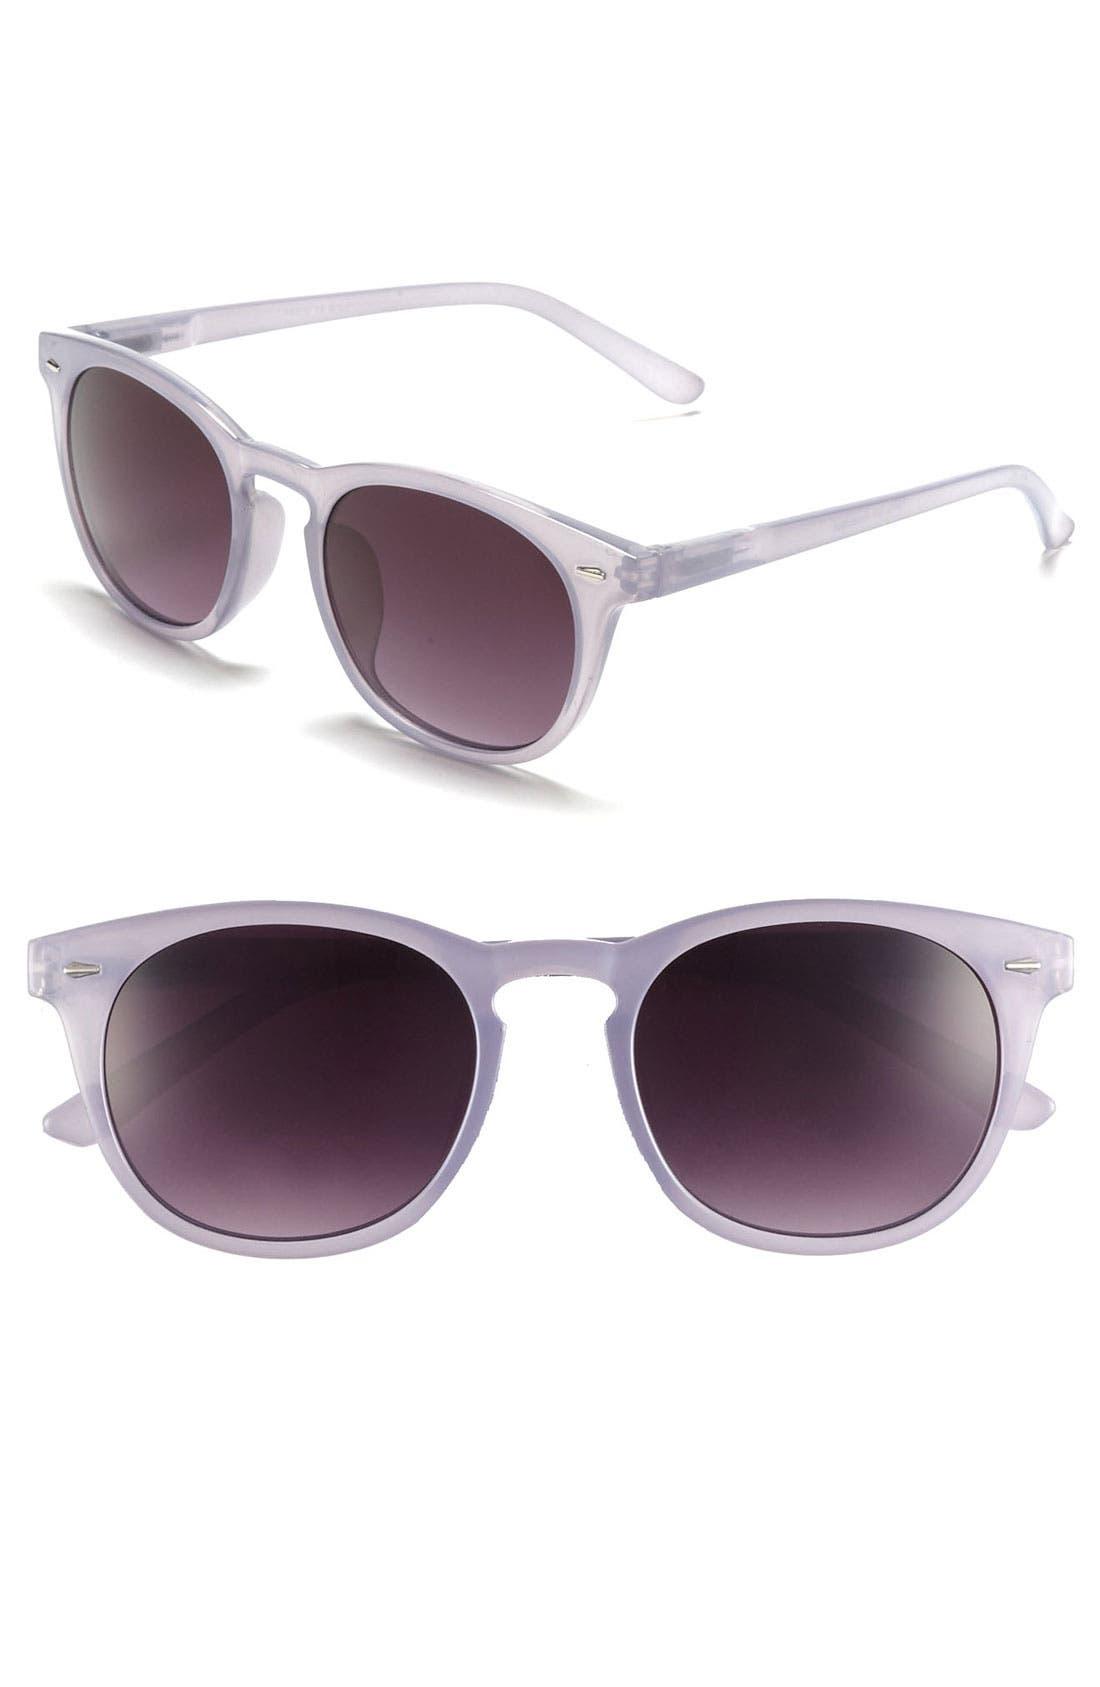 Alternate Image 1 Selected - FE NY 'Princeton' Sunglasses